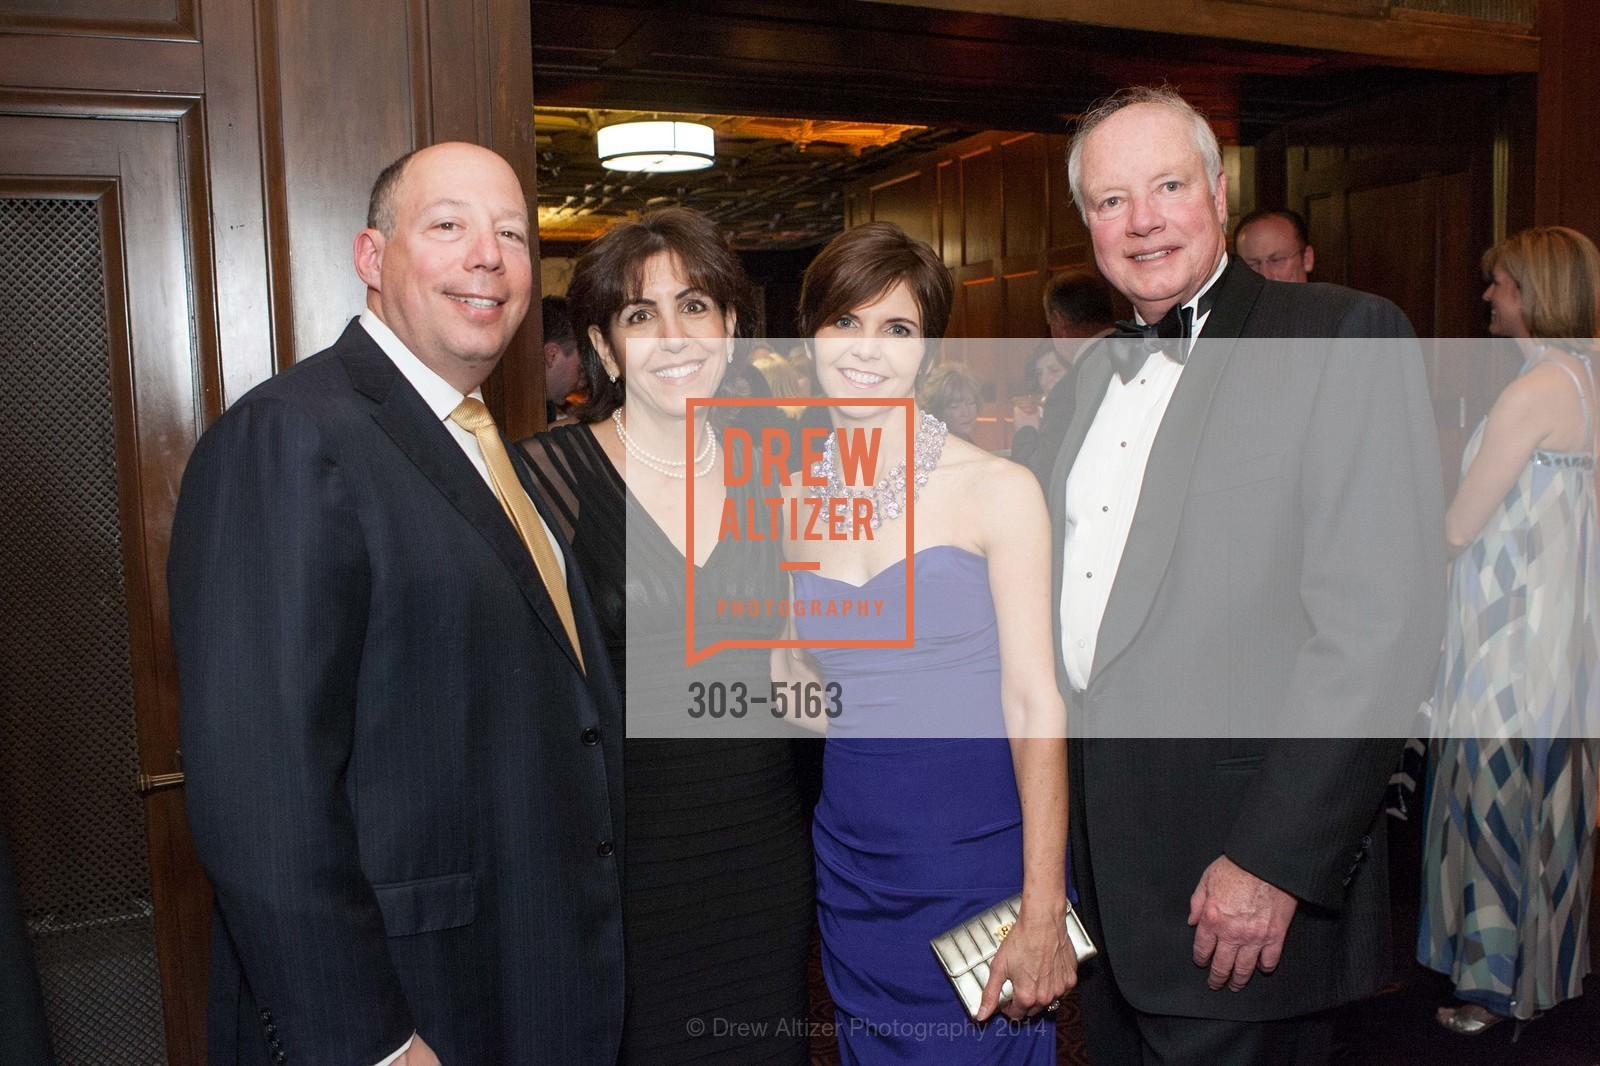 Peter Rosenthal, Patty Rosenthal, Marguerite Feist, Don Feist, Photo #303-5163